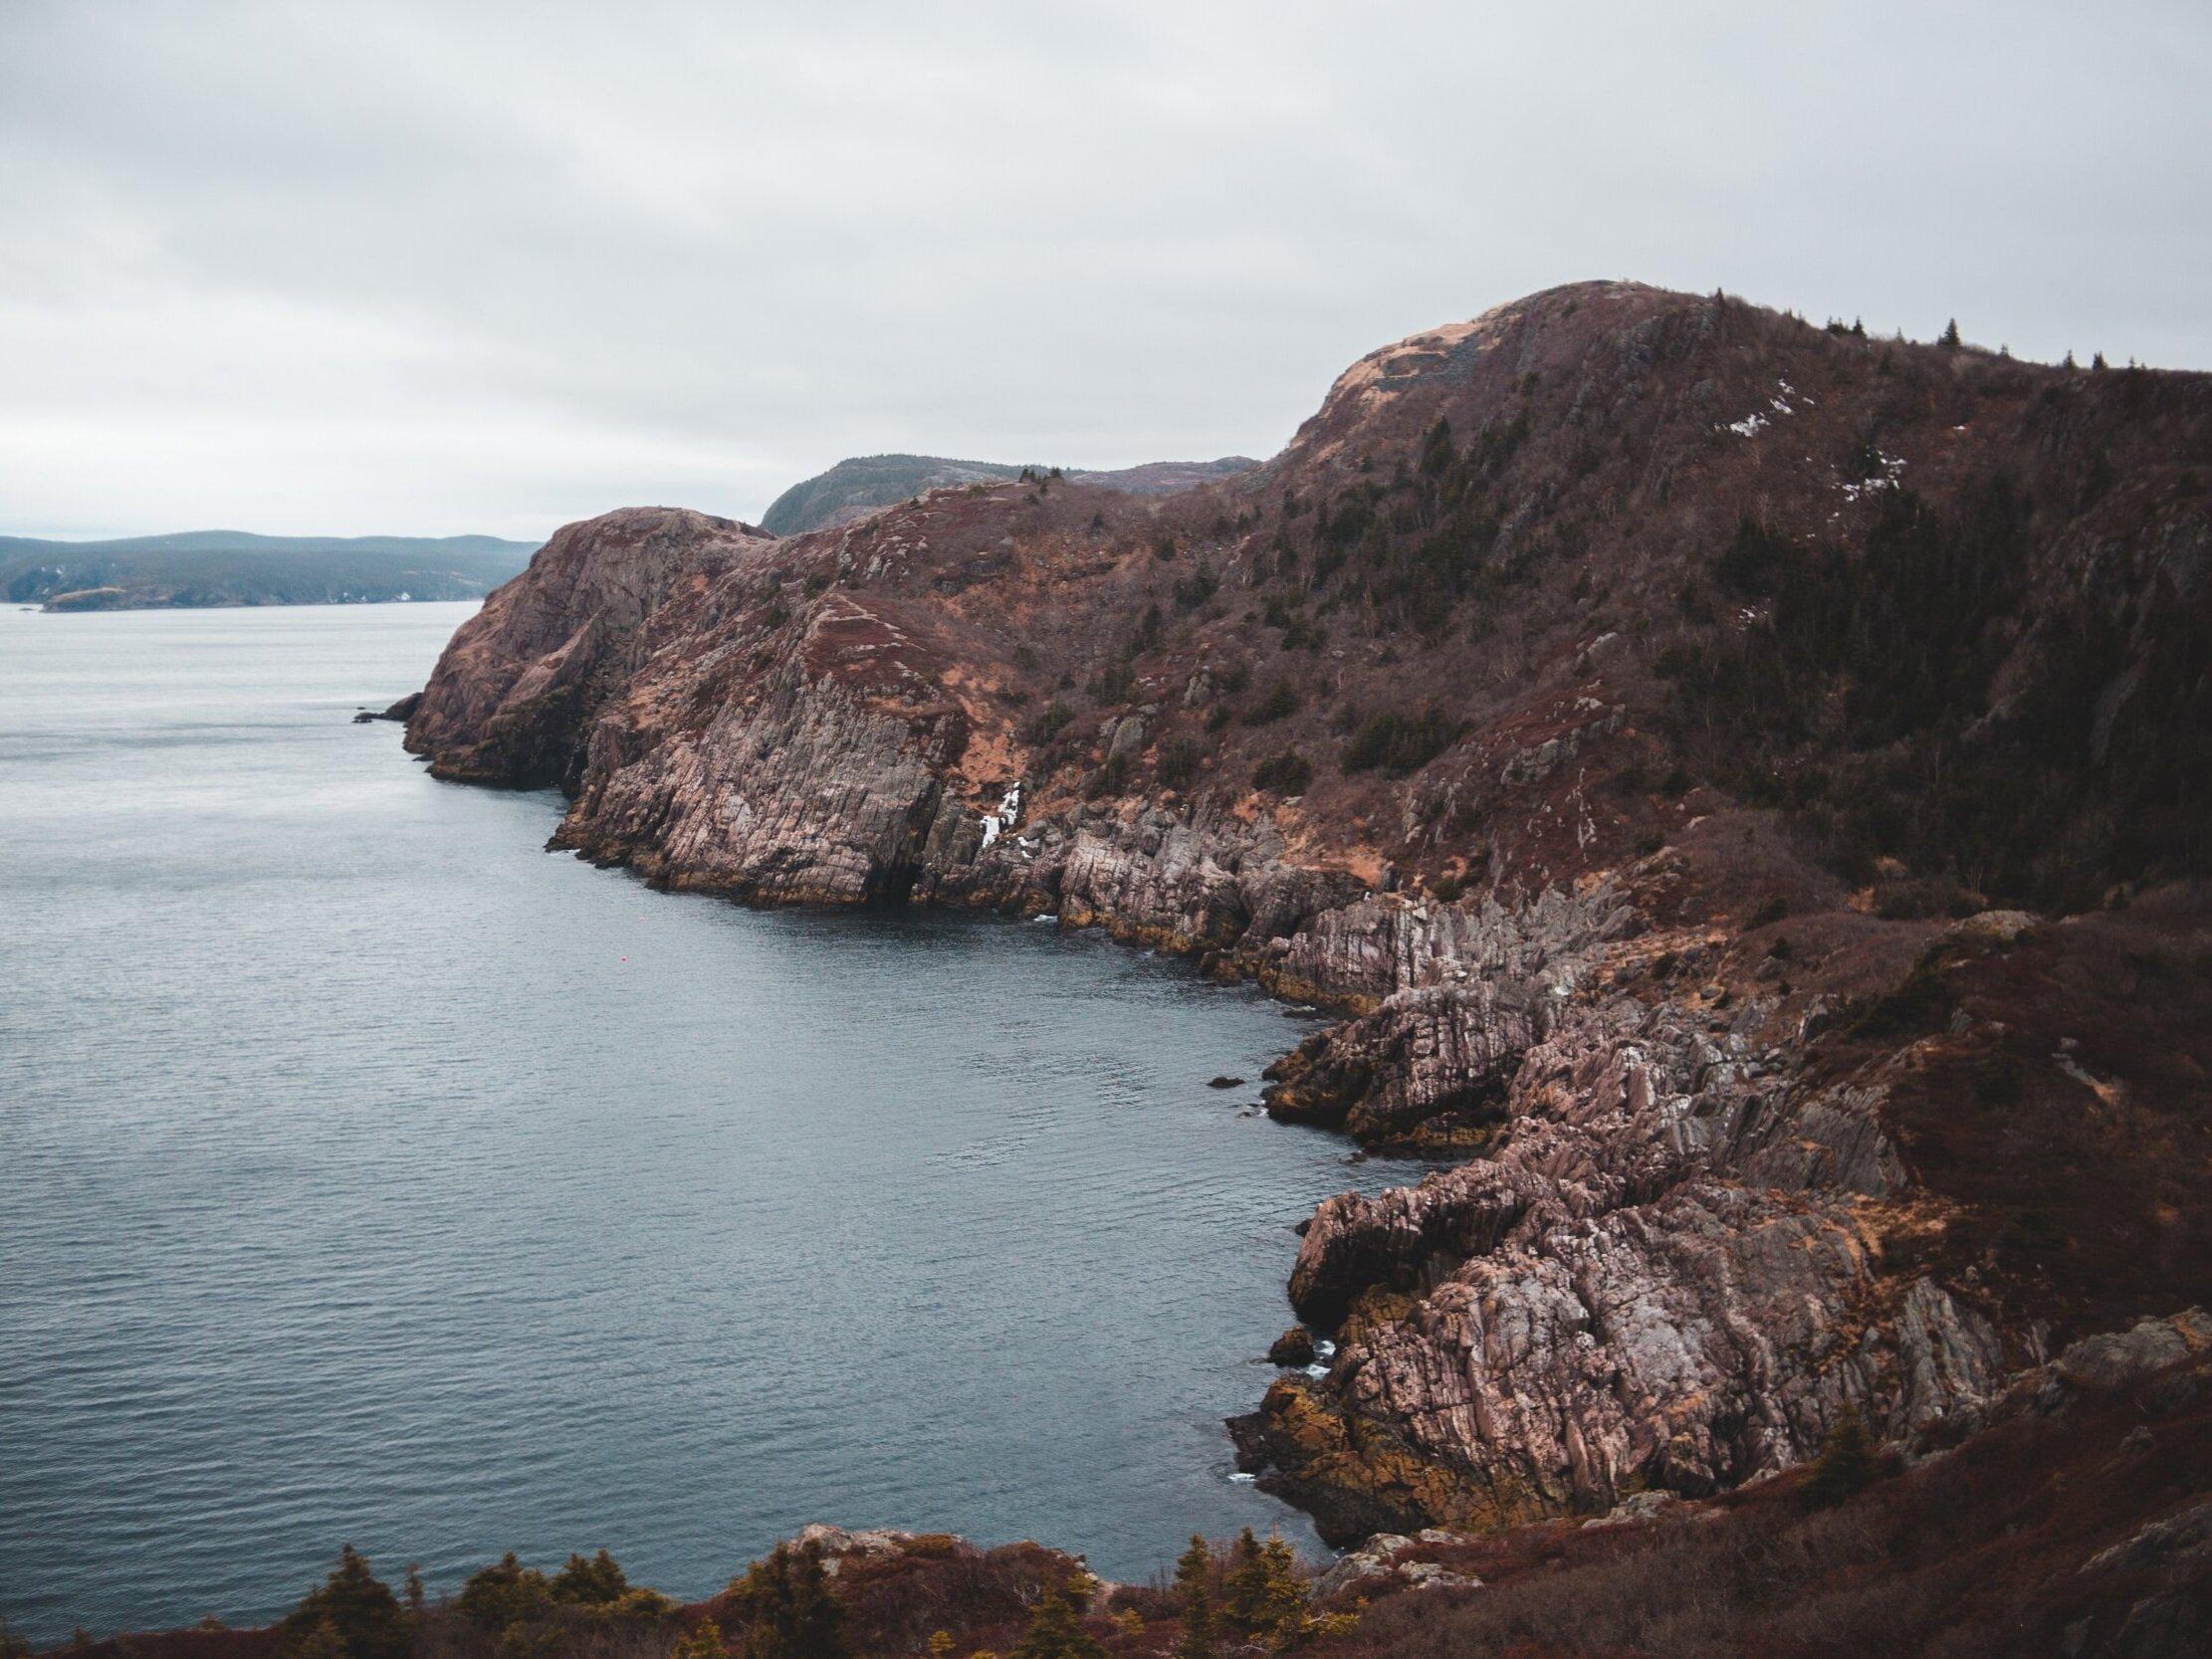 Newfoundland, Canada Running Holiday - Sep 4th - 7th, 2020